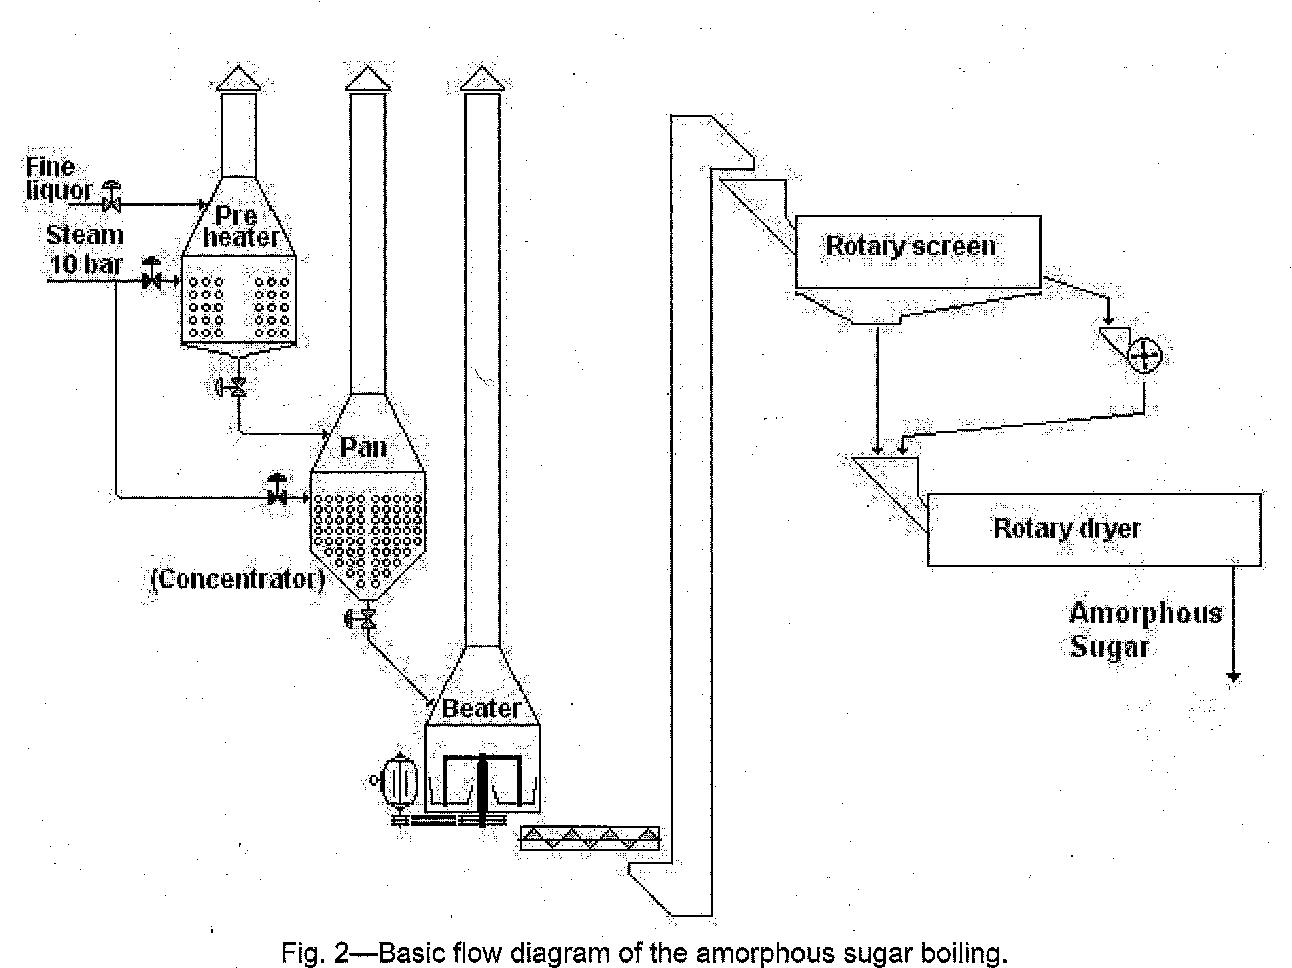 2-basic flow diagram of the amorphous sugar boiling